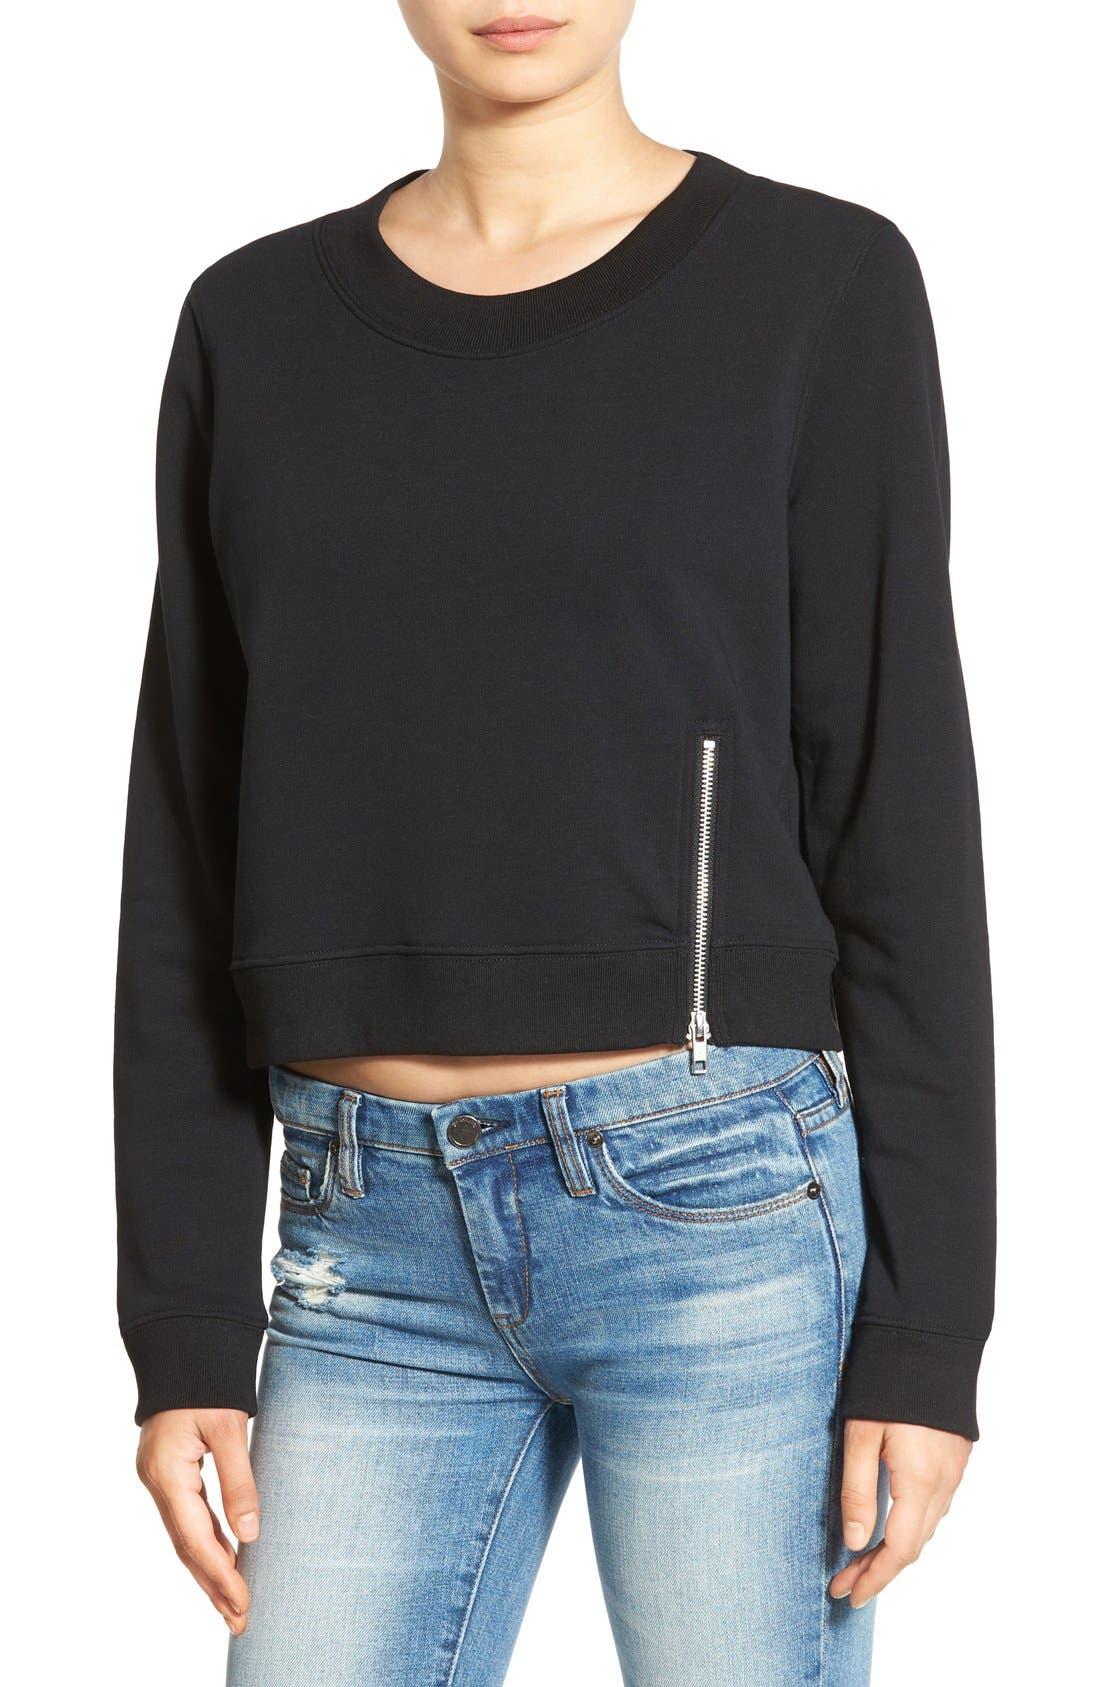 Alternate Image 1 Selected - Cheap Monday 'Exact' Zip Hem Sweatshirt